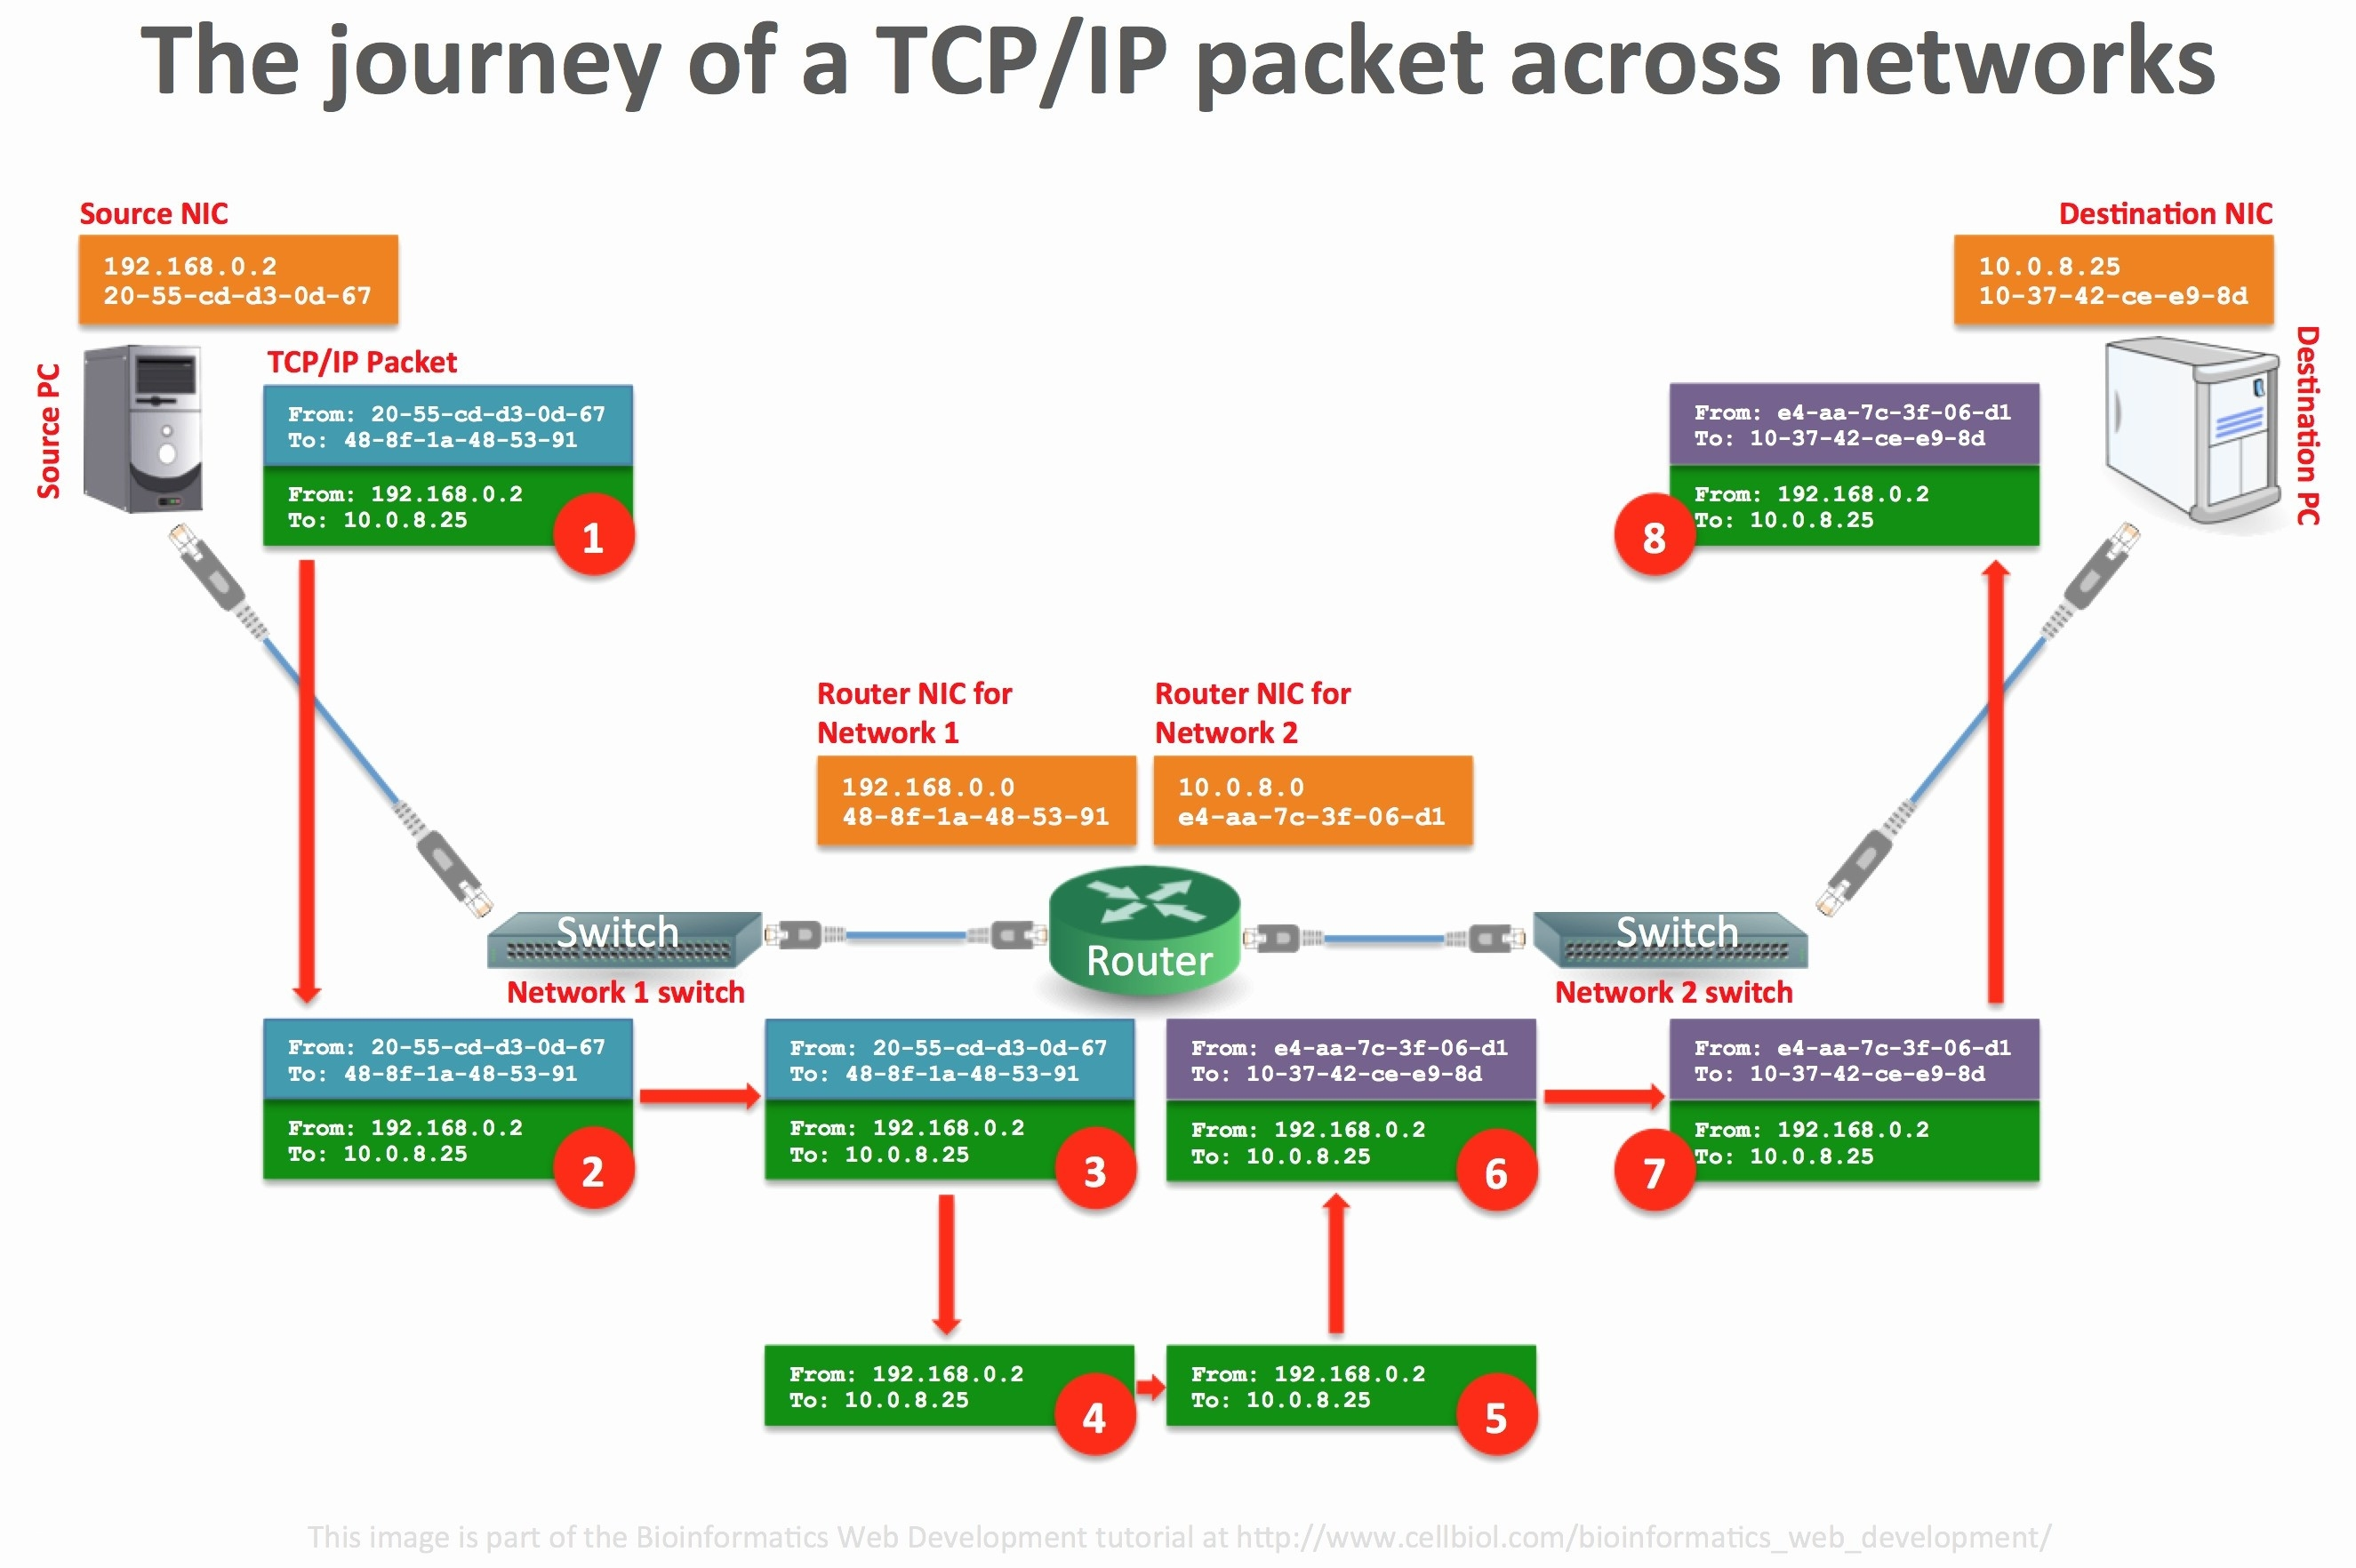 ethernet wiring diagram Download-Wiring Diagram Ethernet Refrence Lan Diagram Best Network Switch Diagram Fresh Web Diagram 0d 13-m